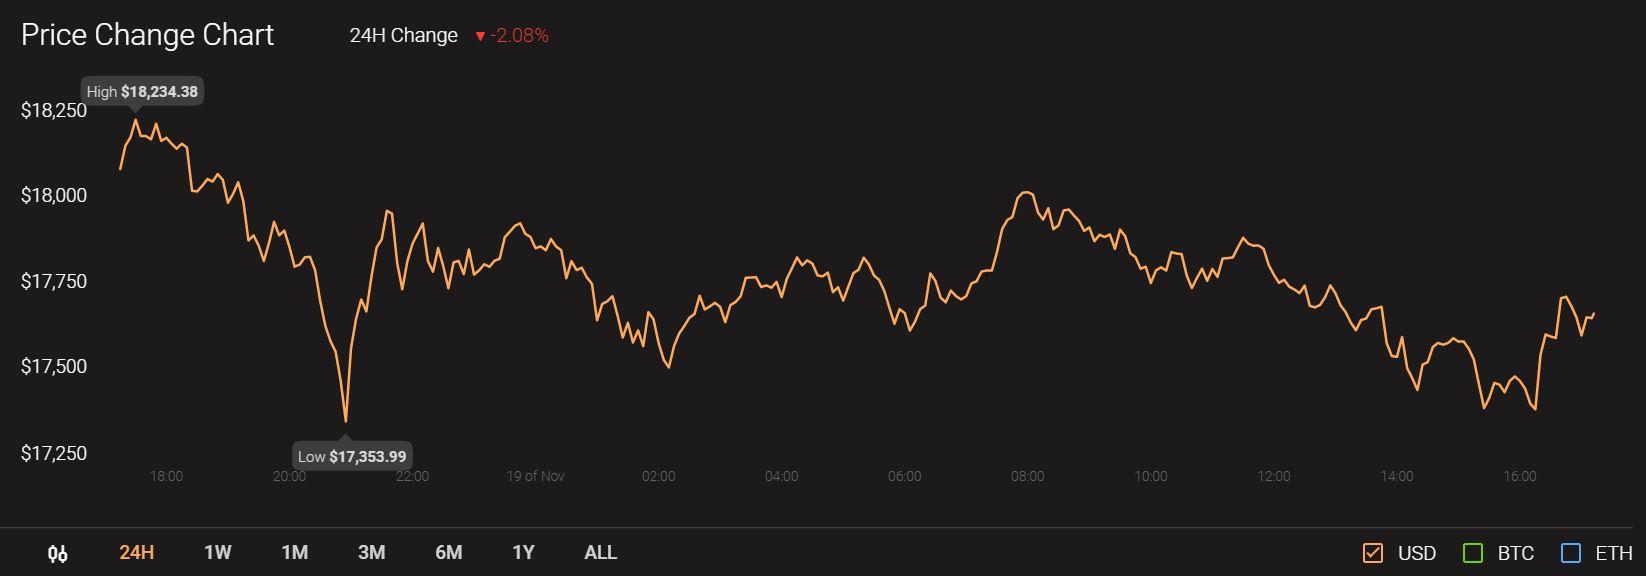 《【EOS币价格分析】EOS,Tron,Zcash价格分析:11月19日》